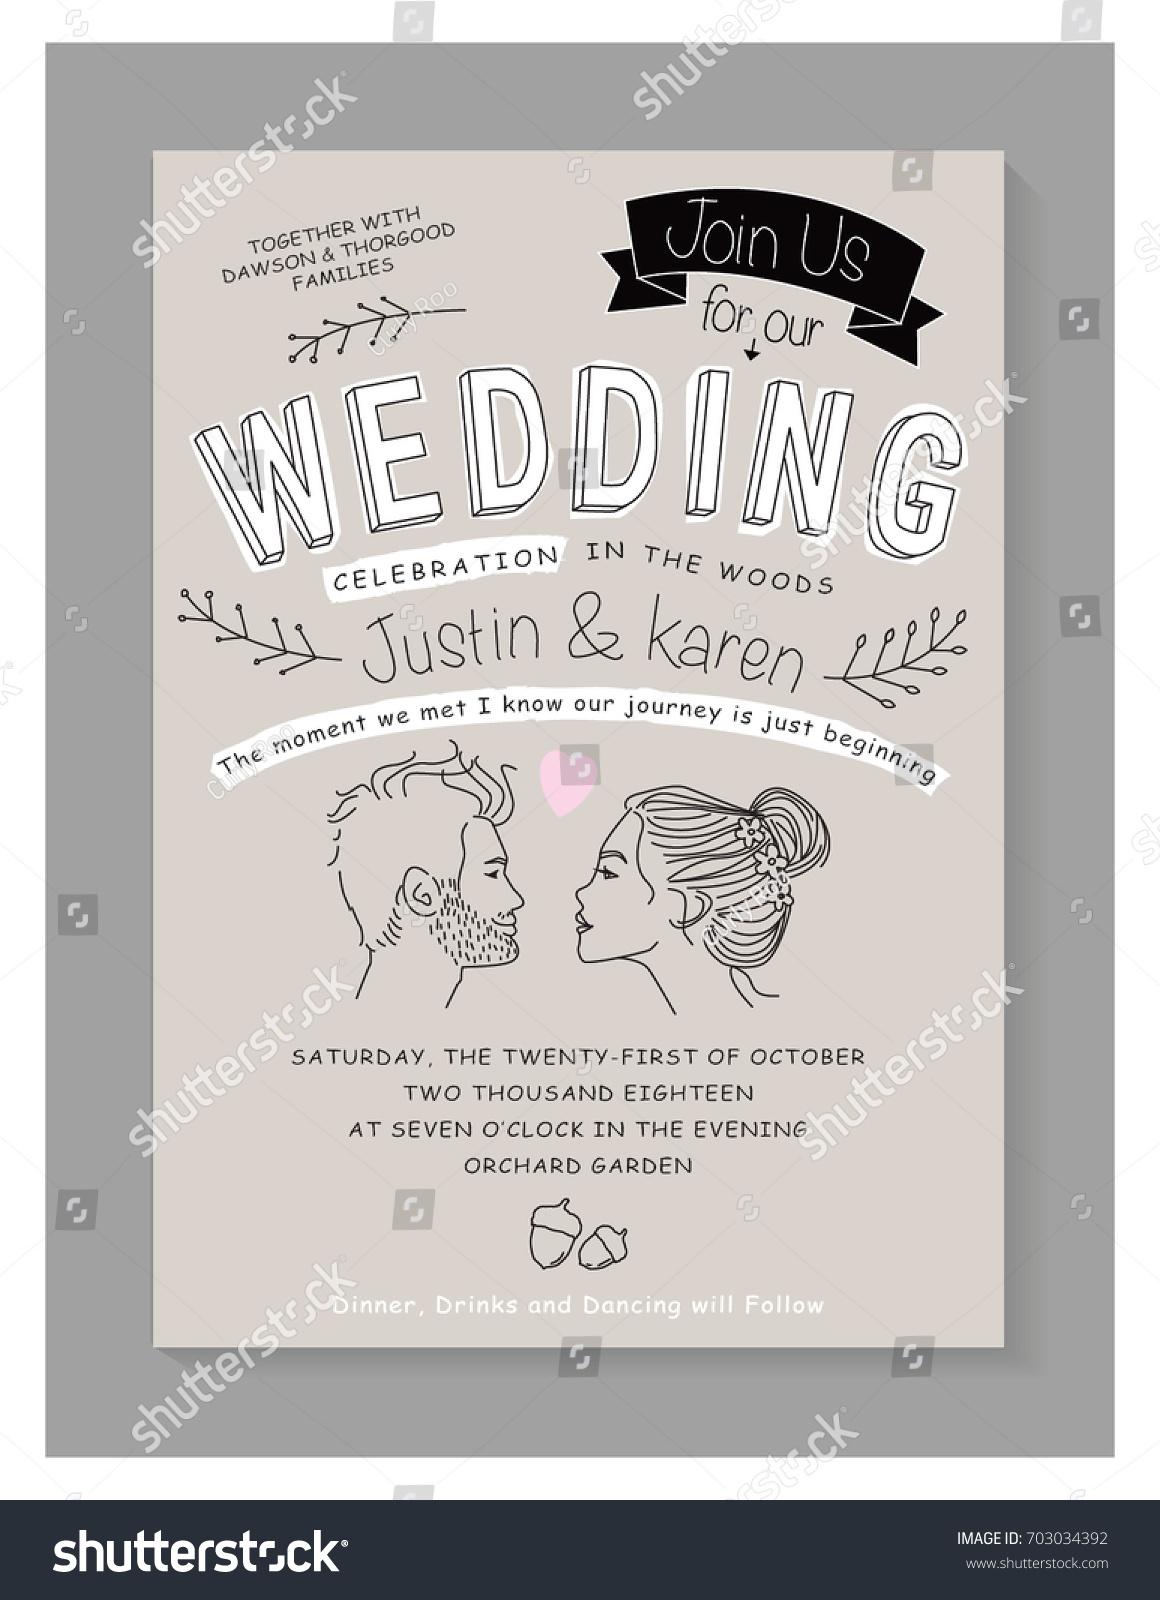 WEDDING INVITATION CARD DESIGN Editable Vector Stock Photo (Photo ...